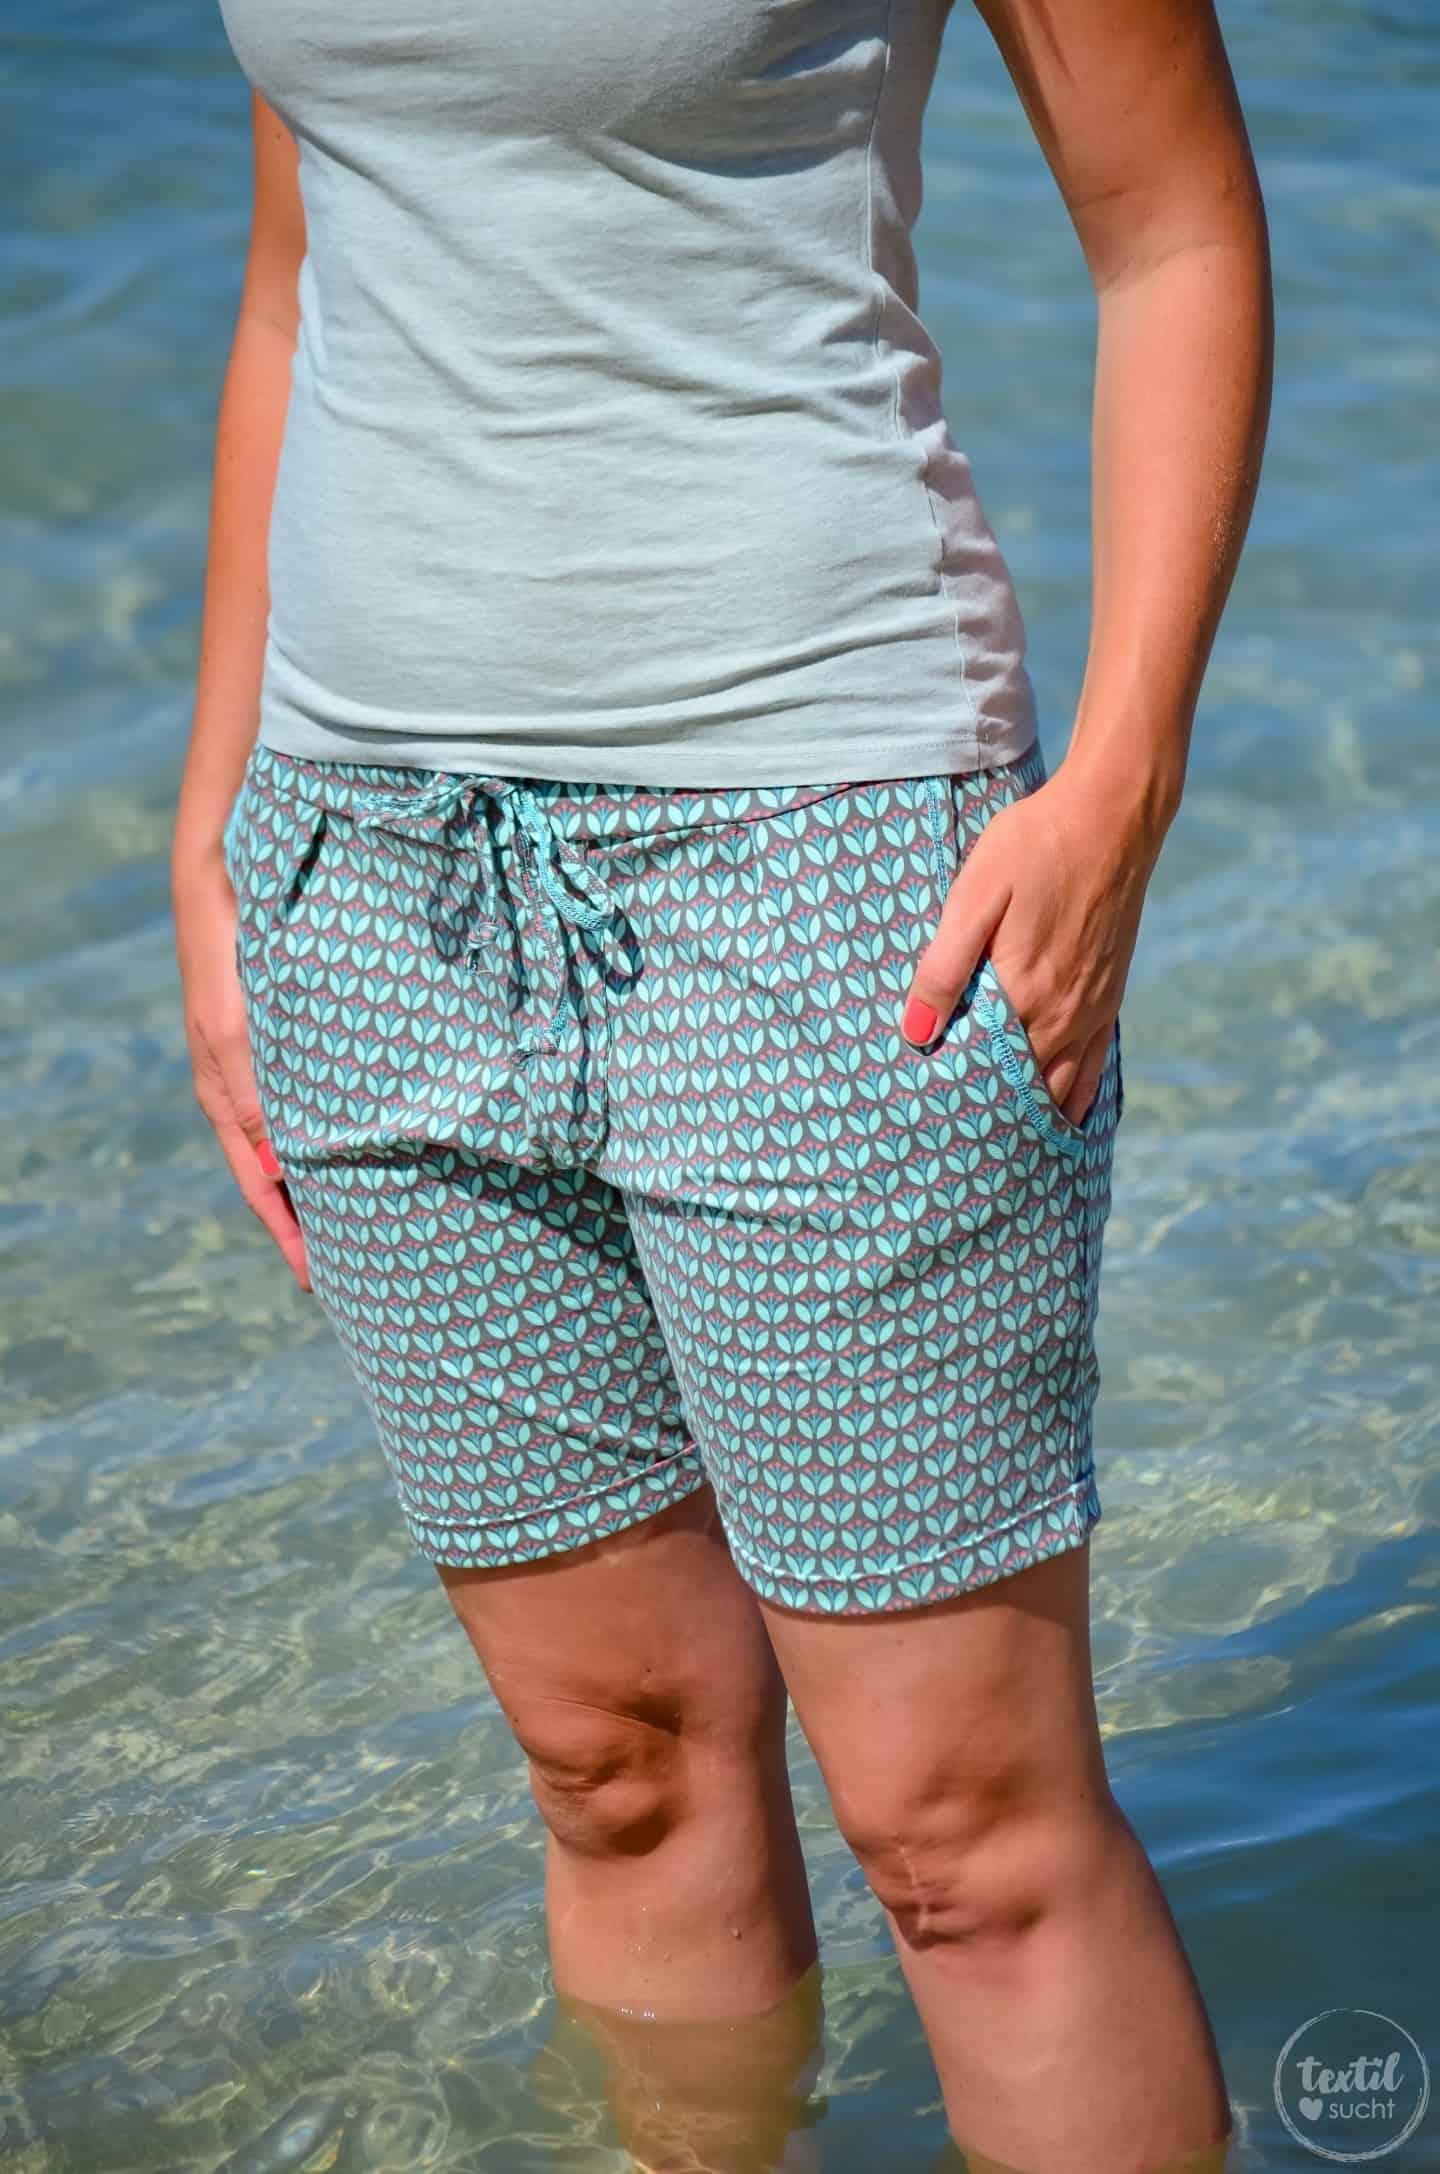 Nähen für den Strand: Schnittmuster Velara als Shorts - Bild 2 | textilsucht.de